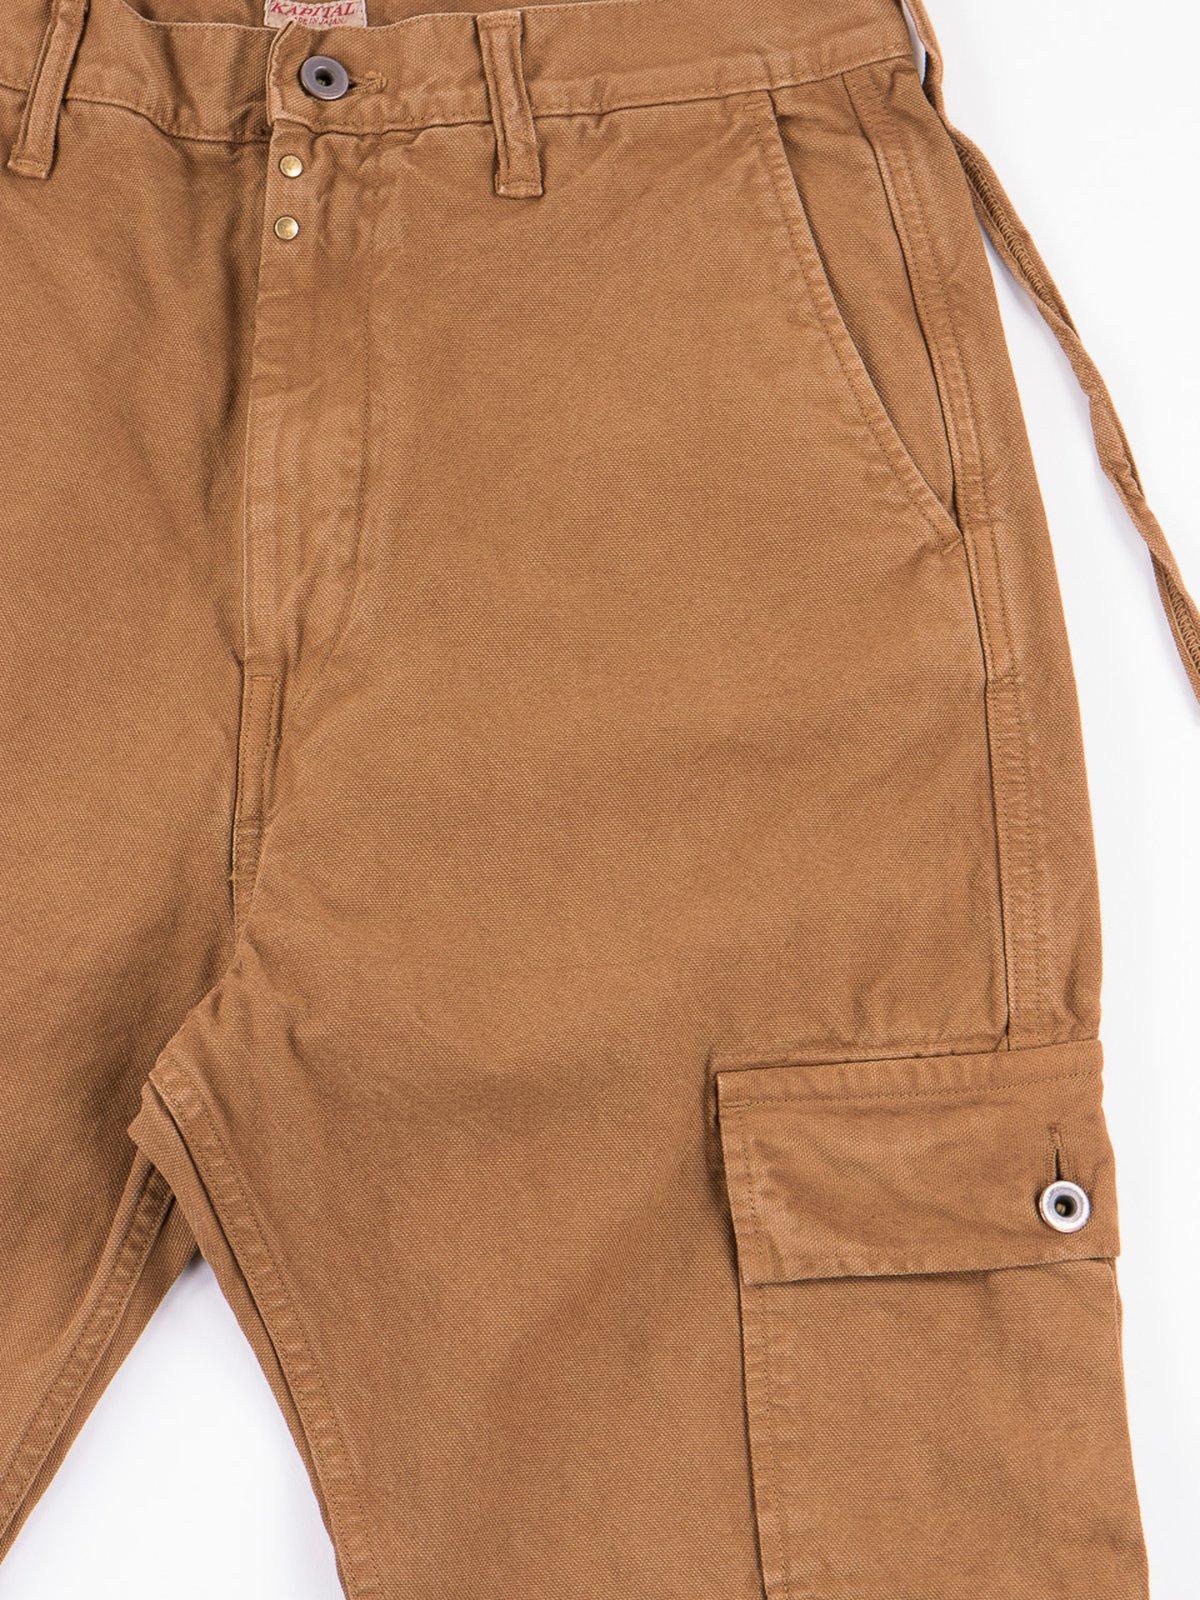 Gold Light Canvas Ringo Man Cargo Pant - Image 2